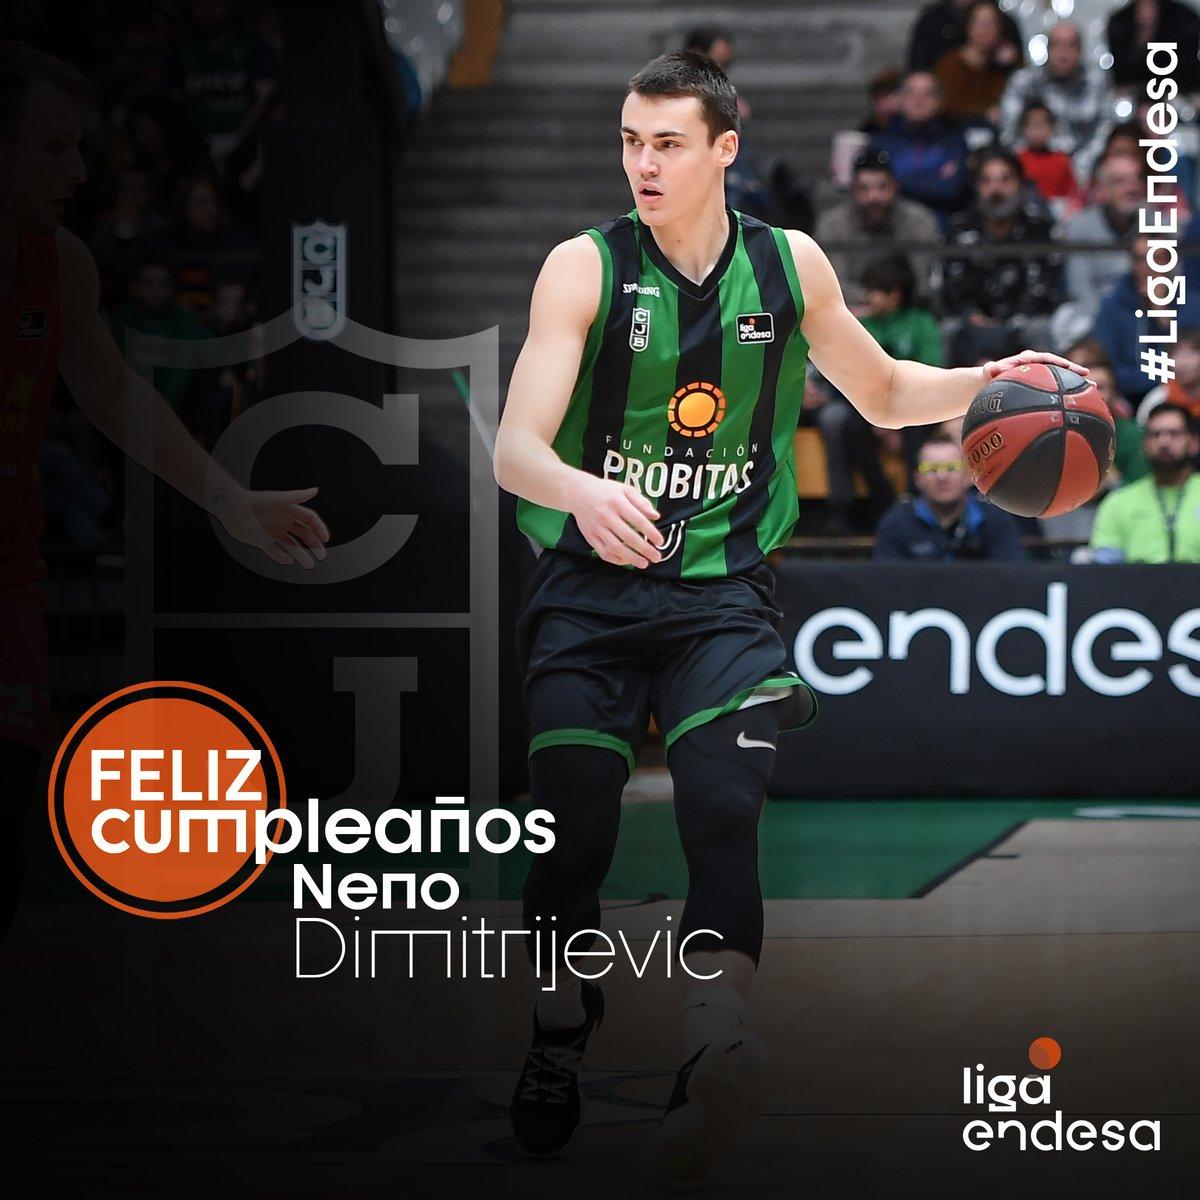 ¡Feliz cumpleaños, @Neno_D7! #LigaEndesa